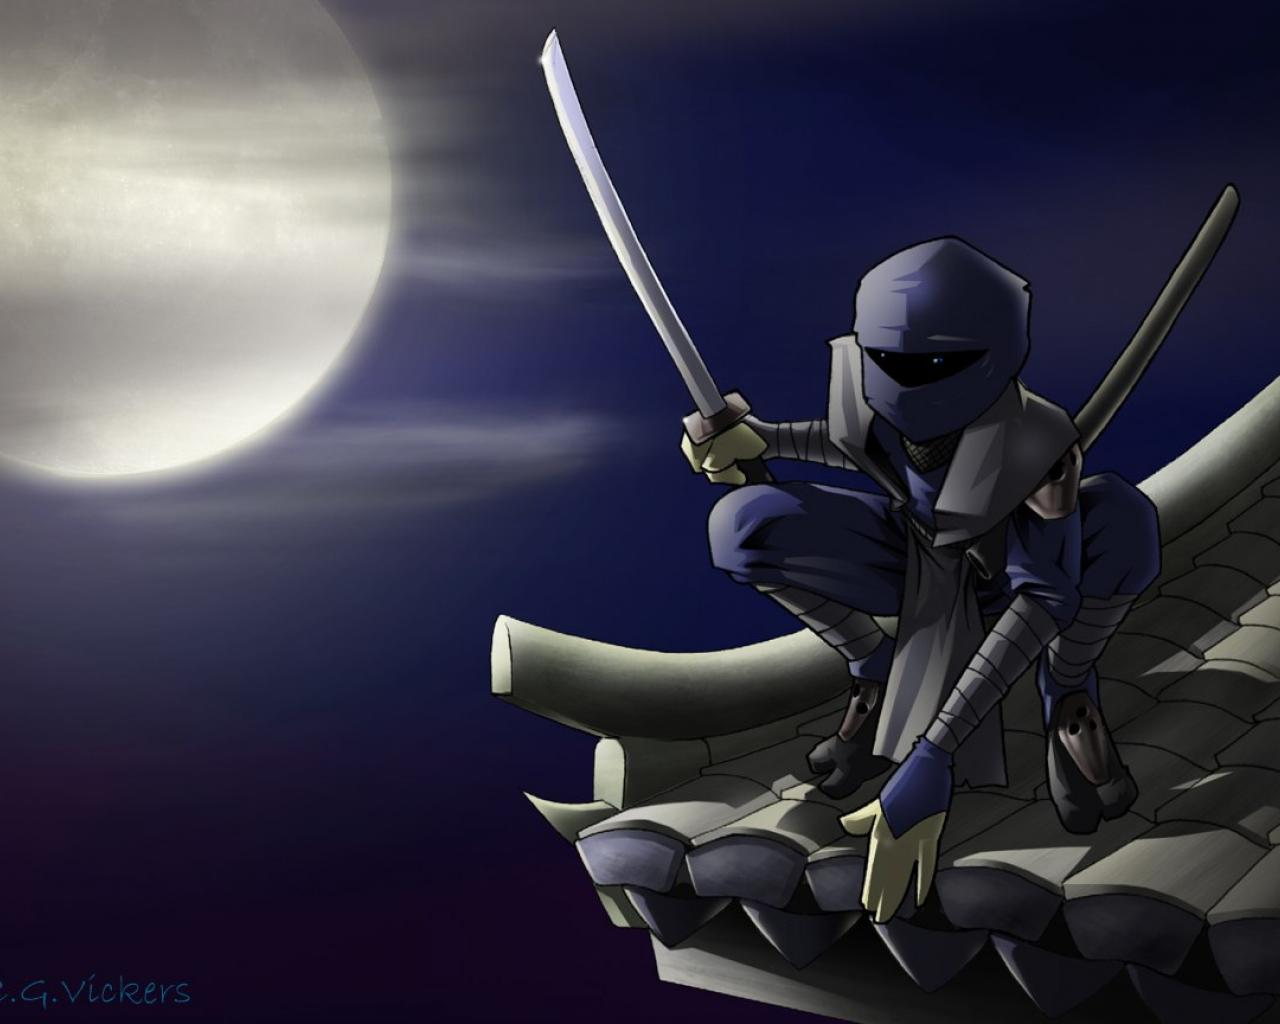 Anime ninja wallpaper wallpapersafari - Ninja anime wallpaper ...